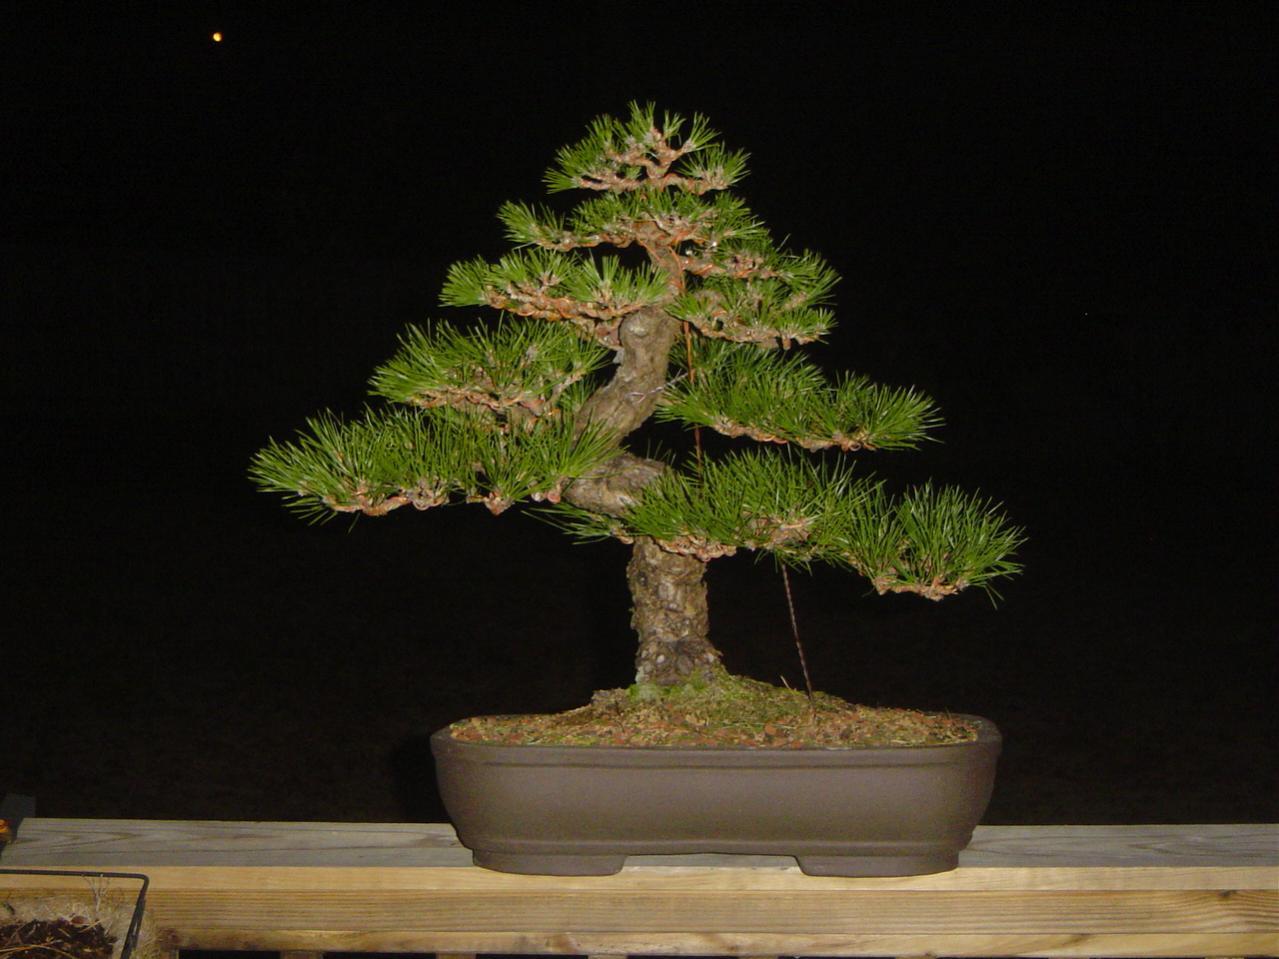 guy wire primer nebari bonsai rh nebaribonsai wordpress com Spruce Bonsai Spruce Bonsai